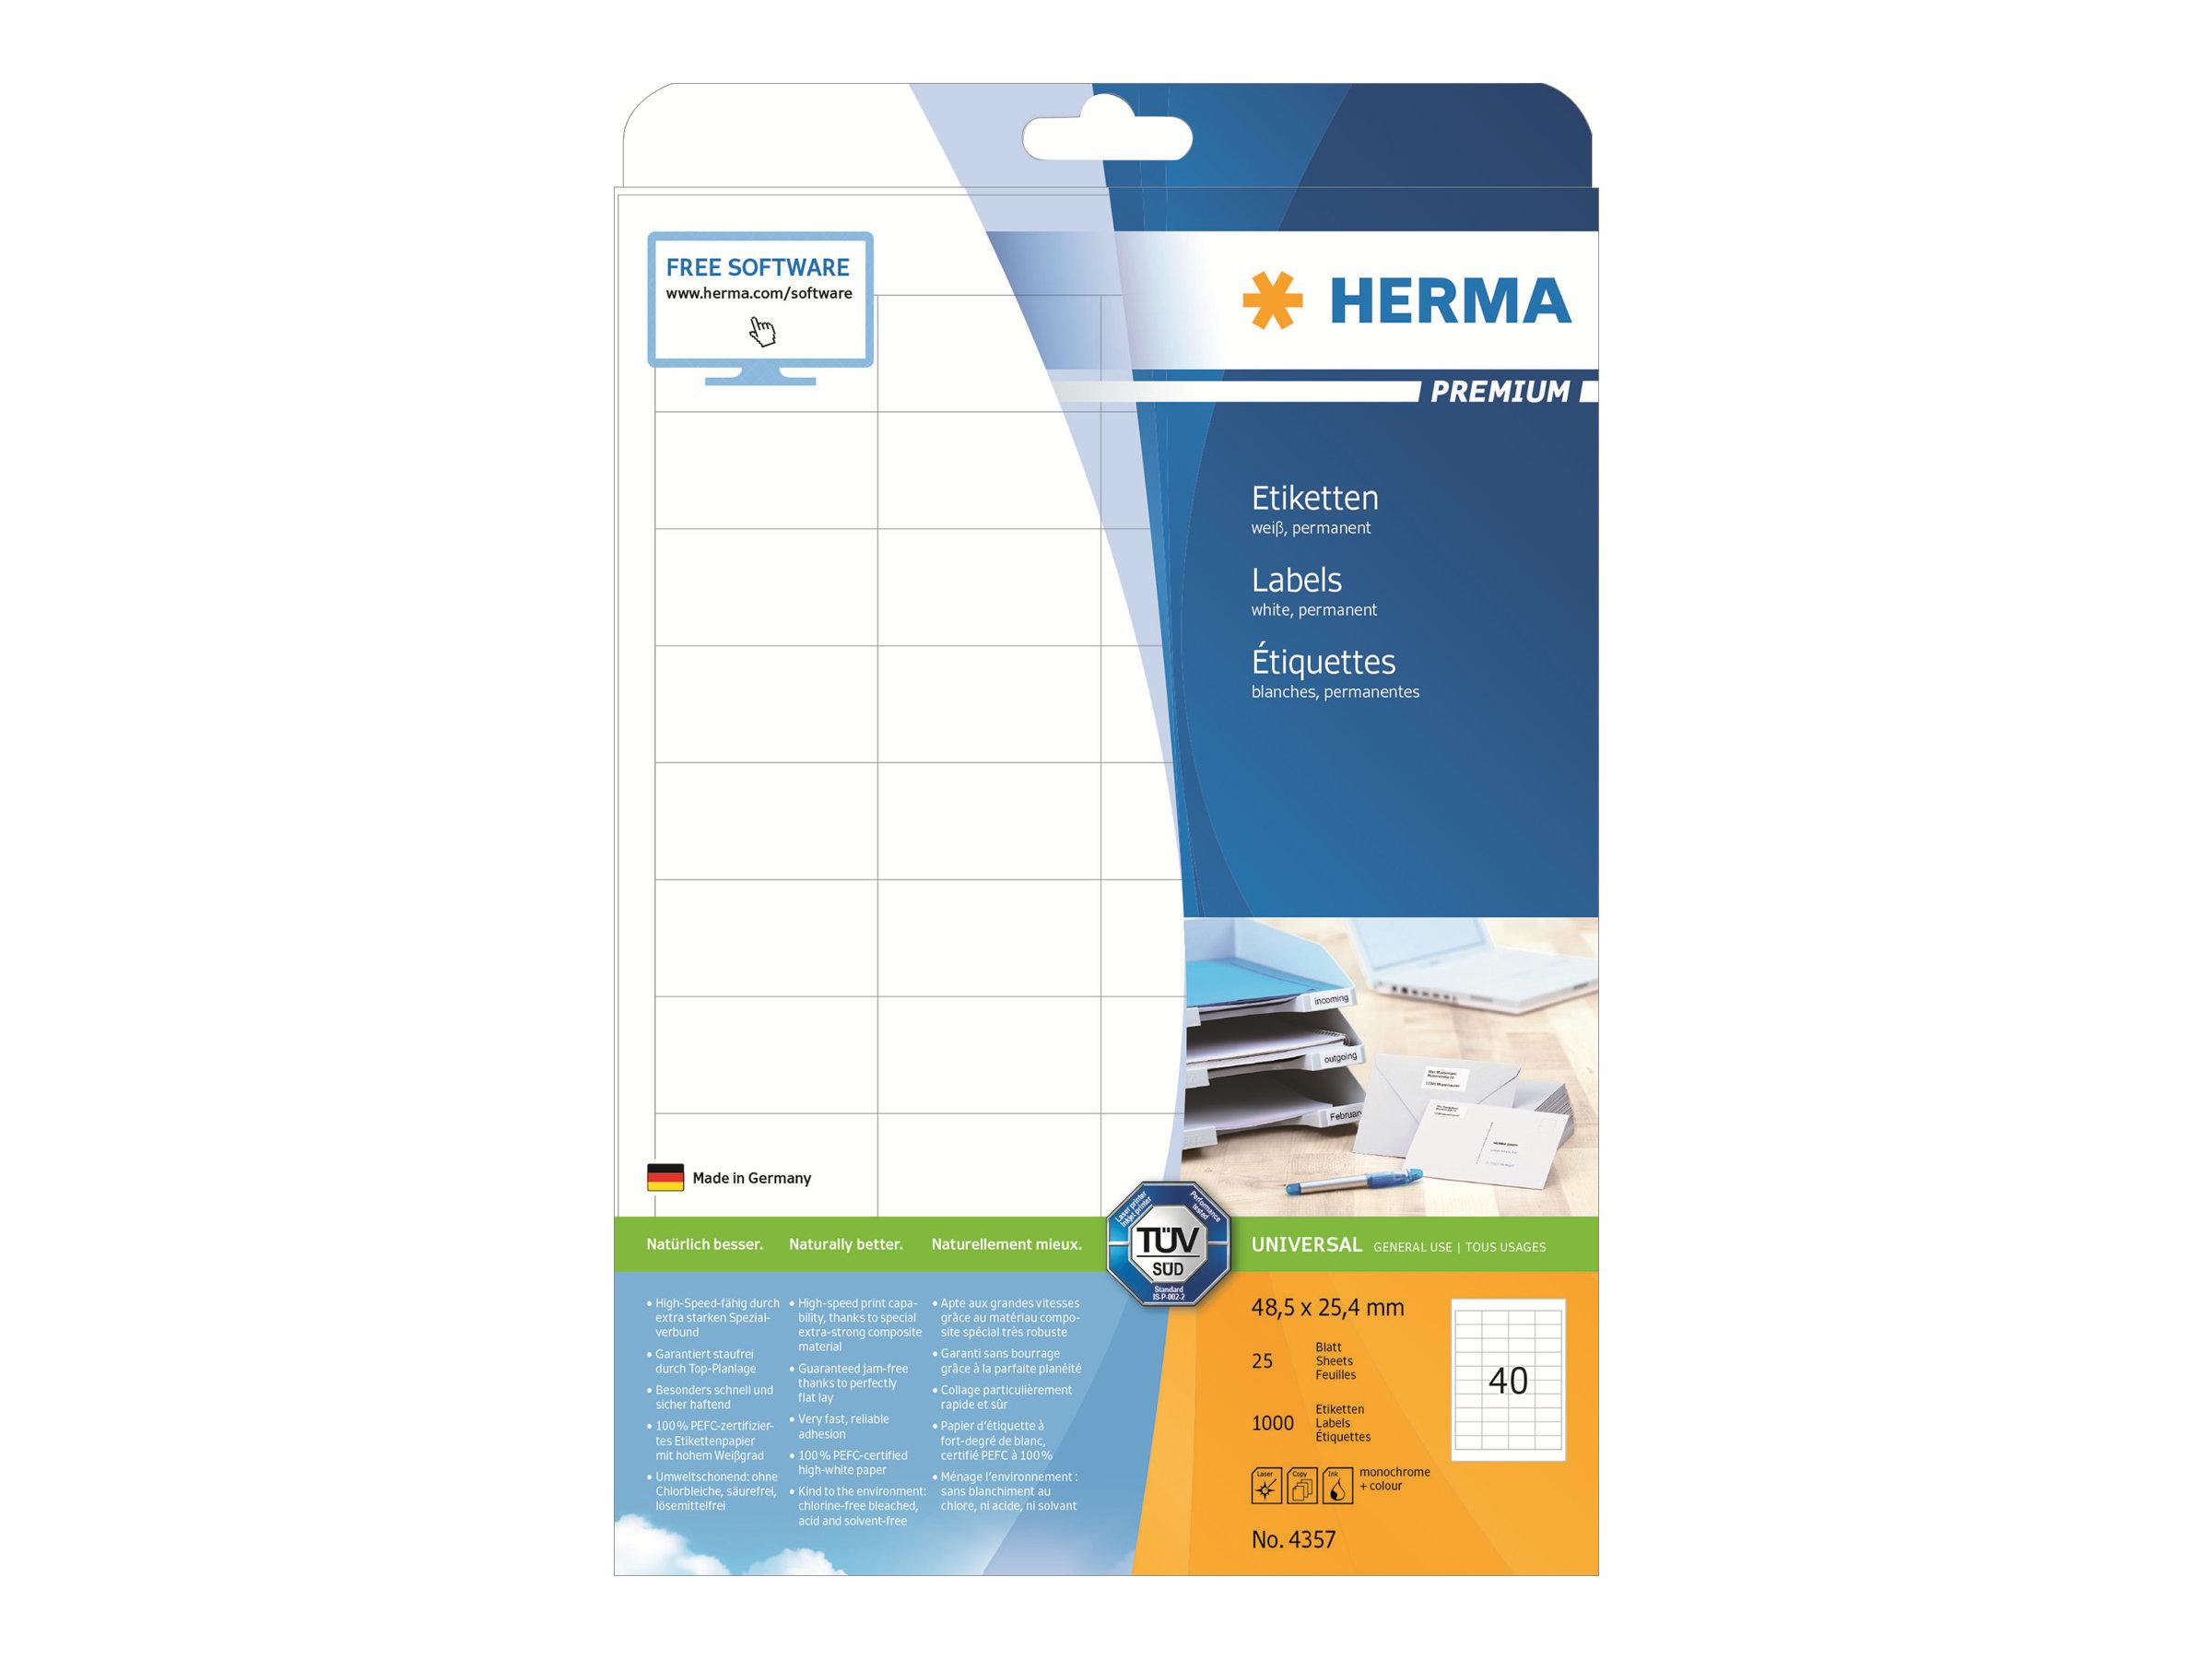 HERMA Premium - Selbstklebend